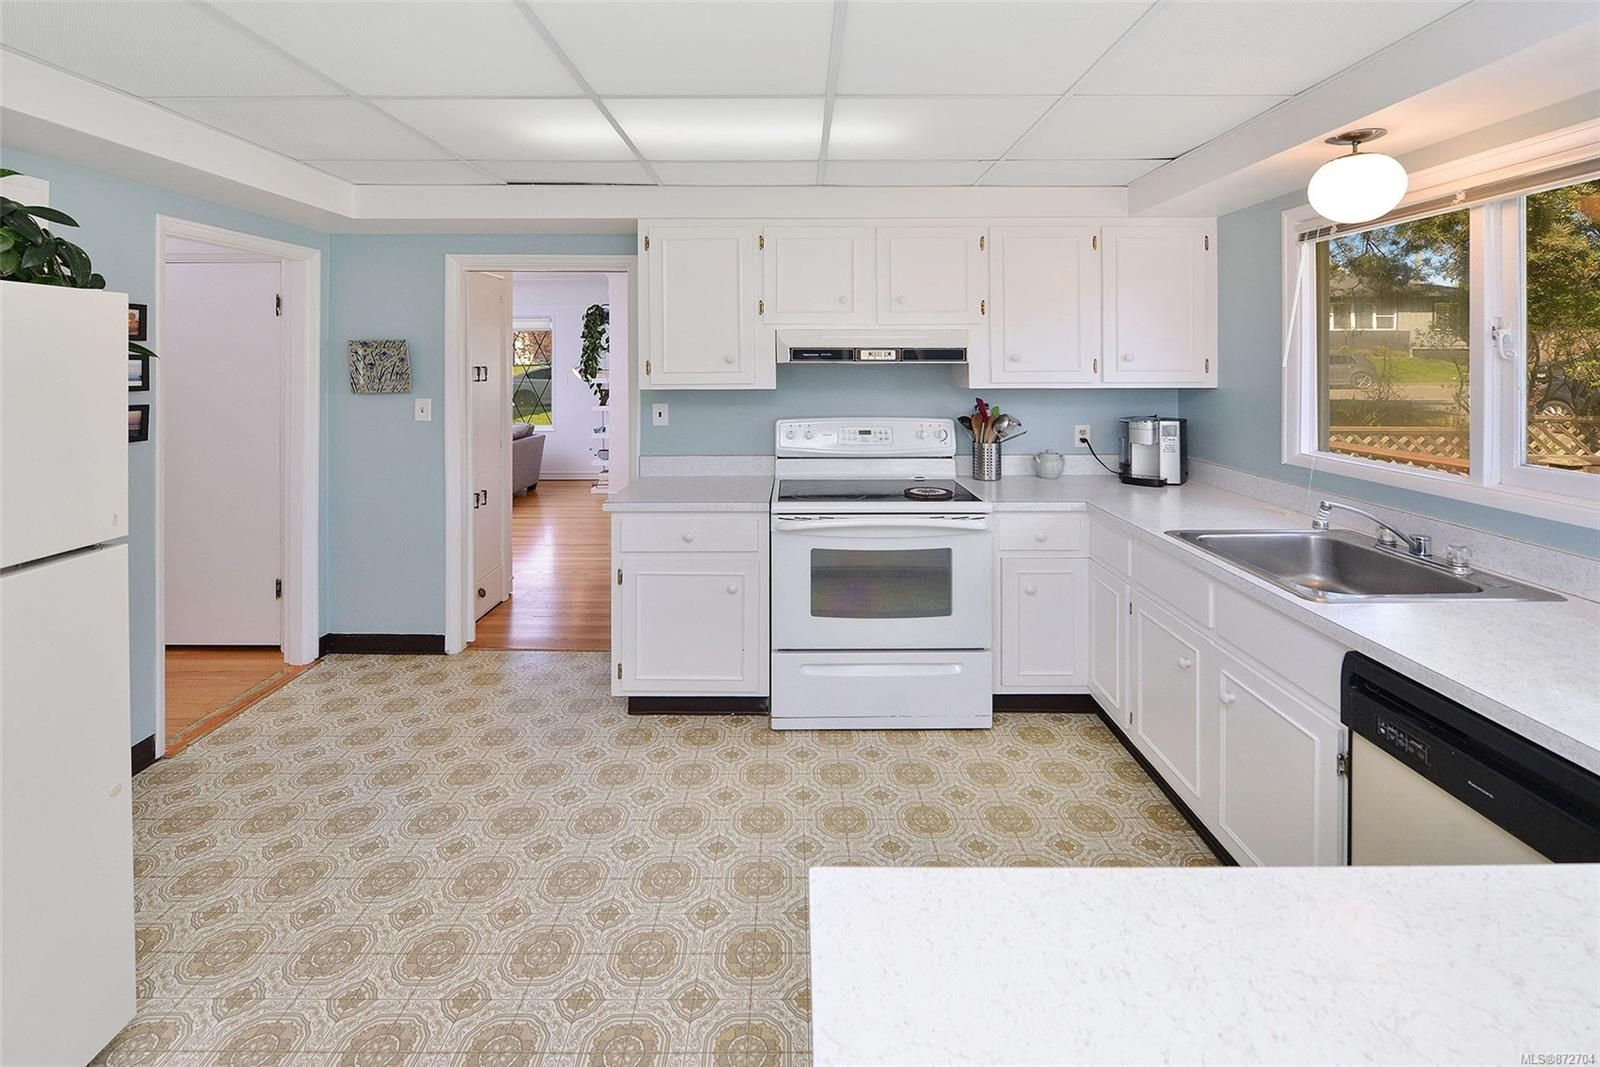 Photo 12: Photos: 2183 Sandowne Rd in : OB Henderson House for sale (Oak Bay)  : MLS®# 872704